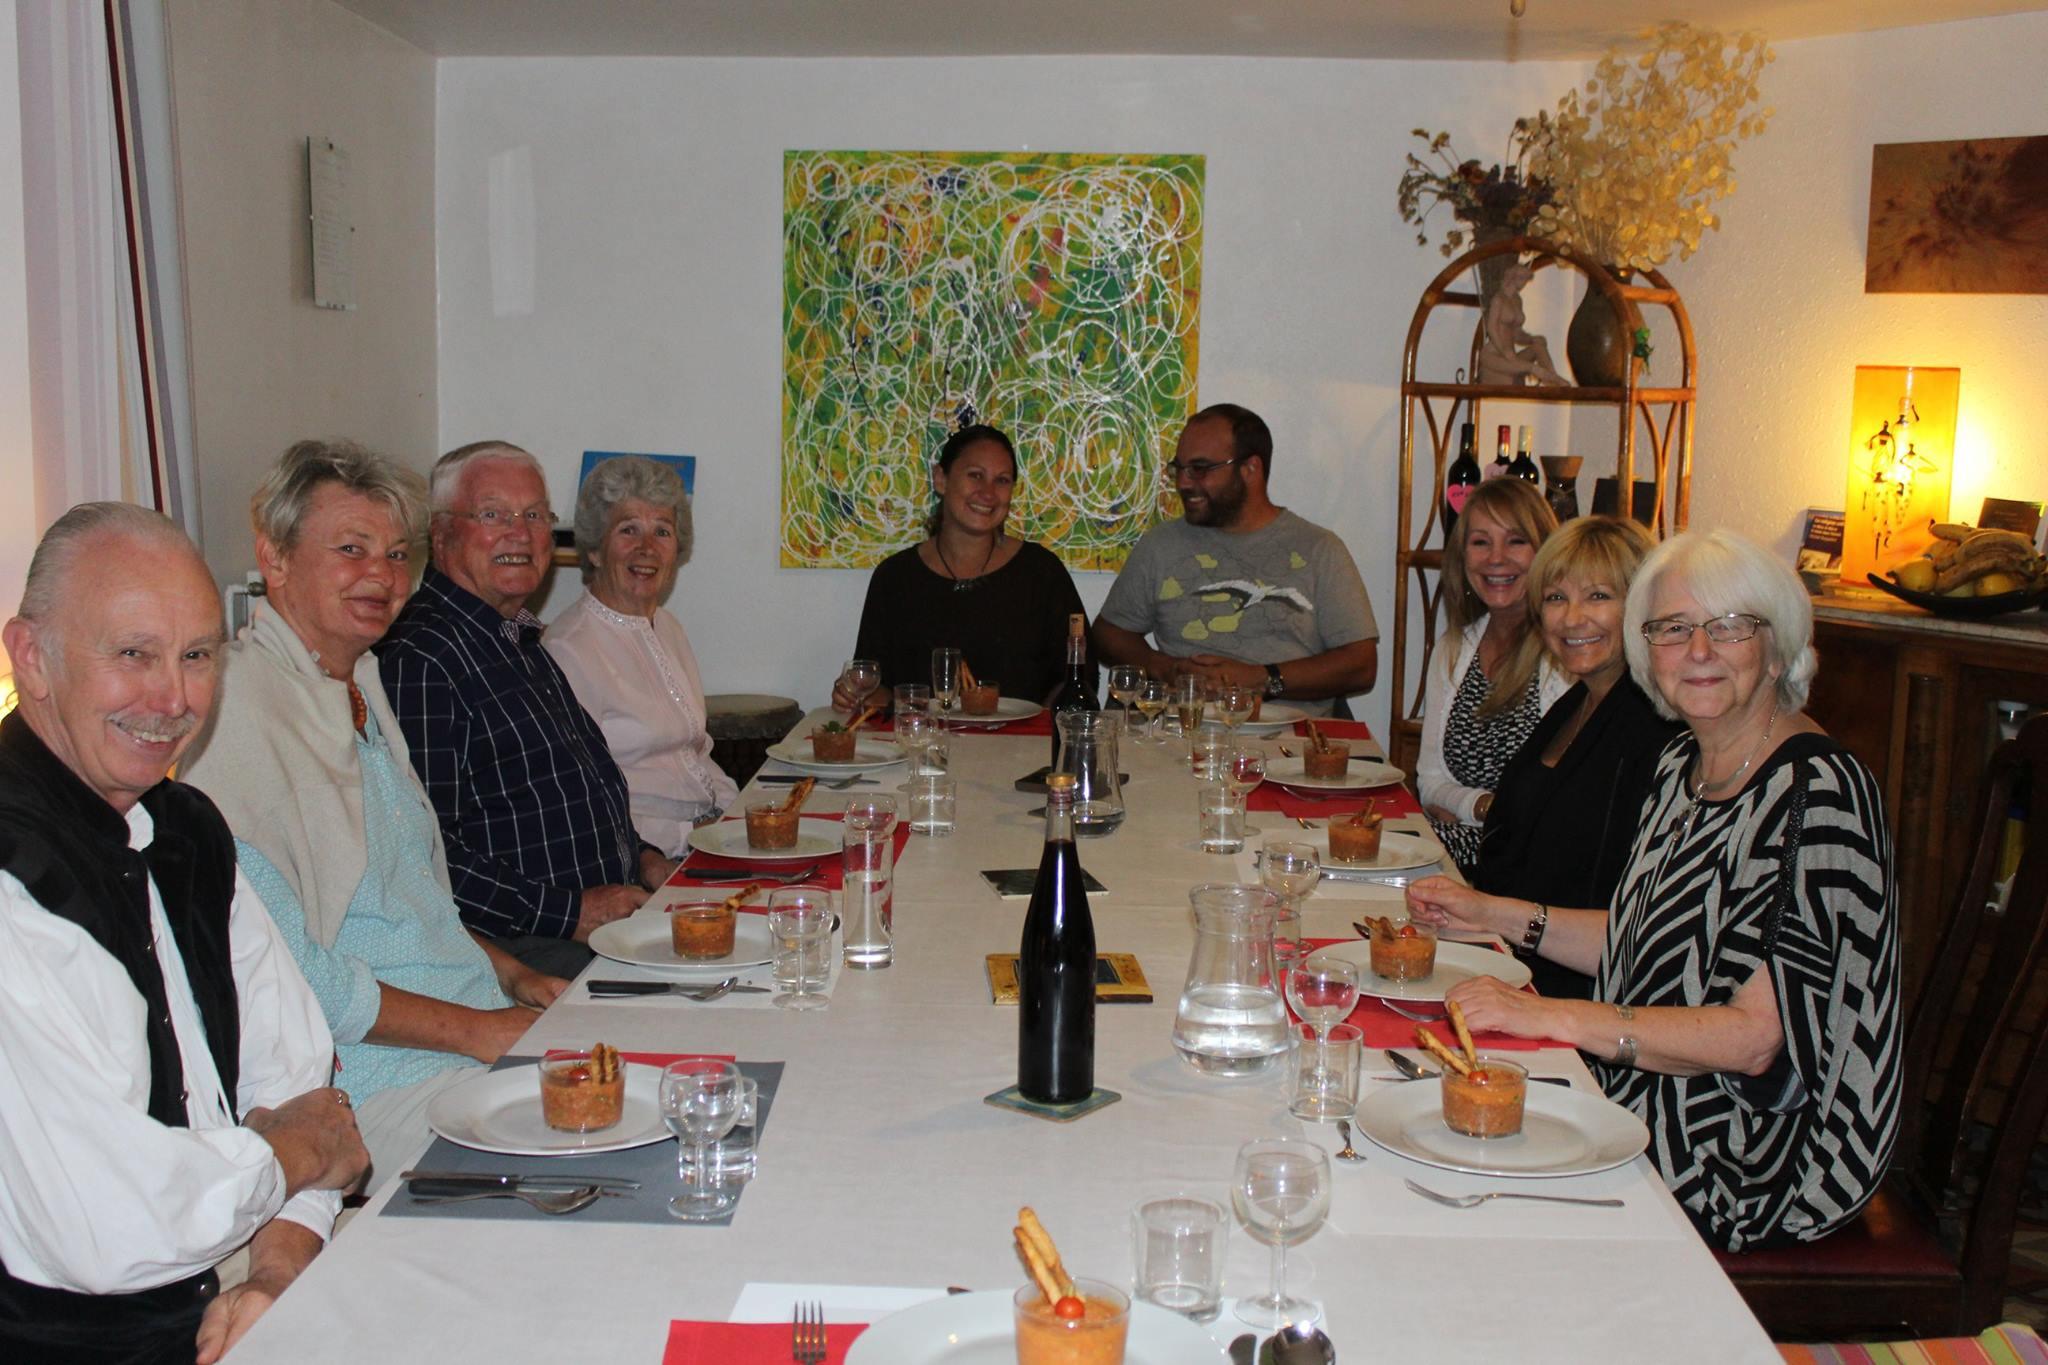 Group Dinner at Au Coeur de Rennes